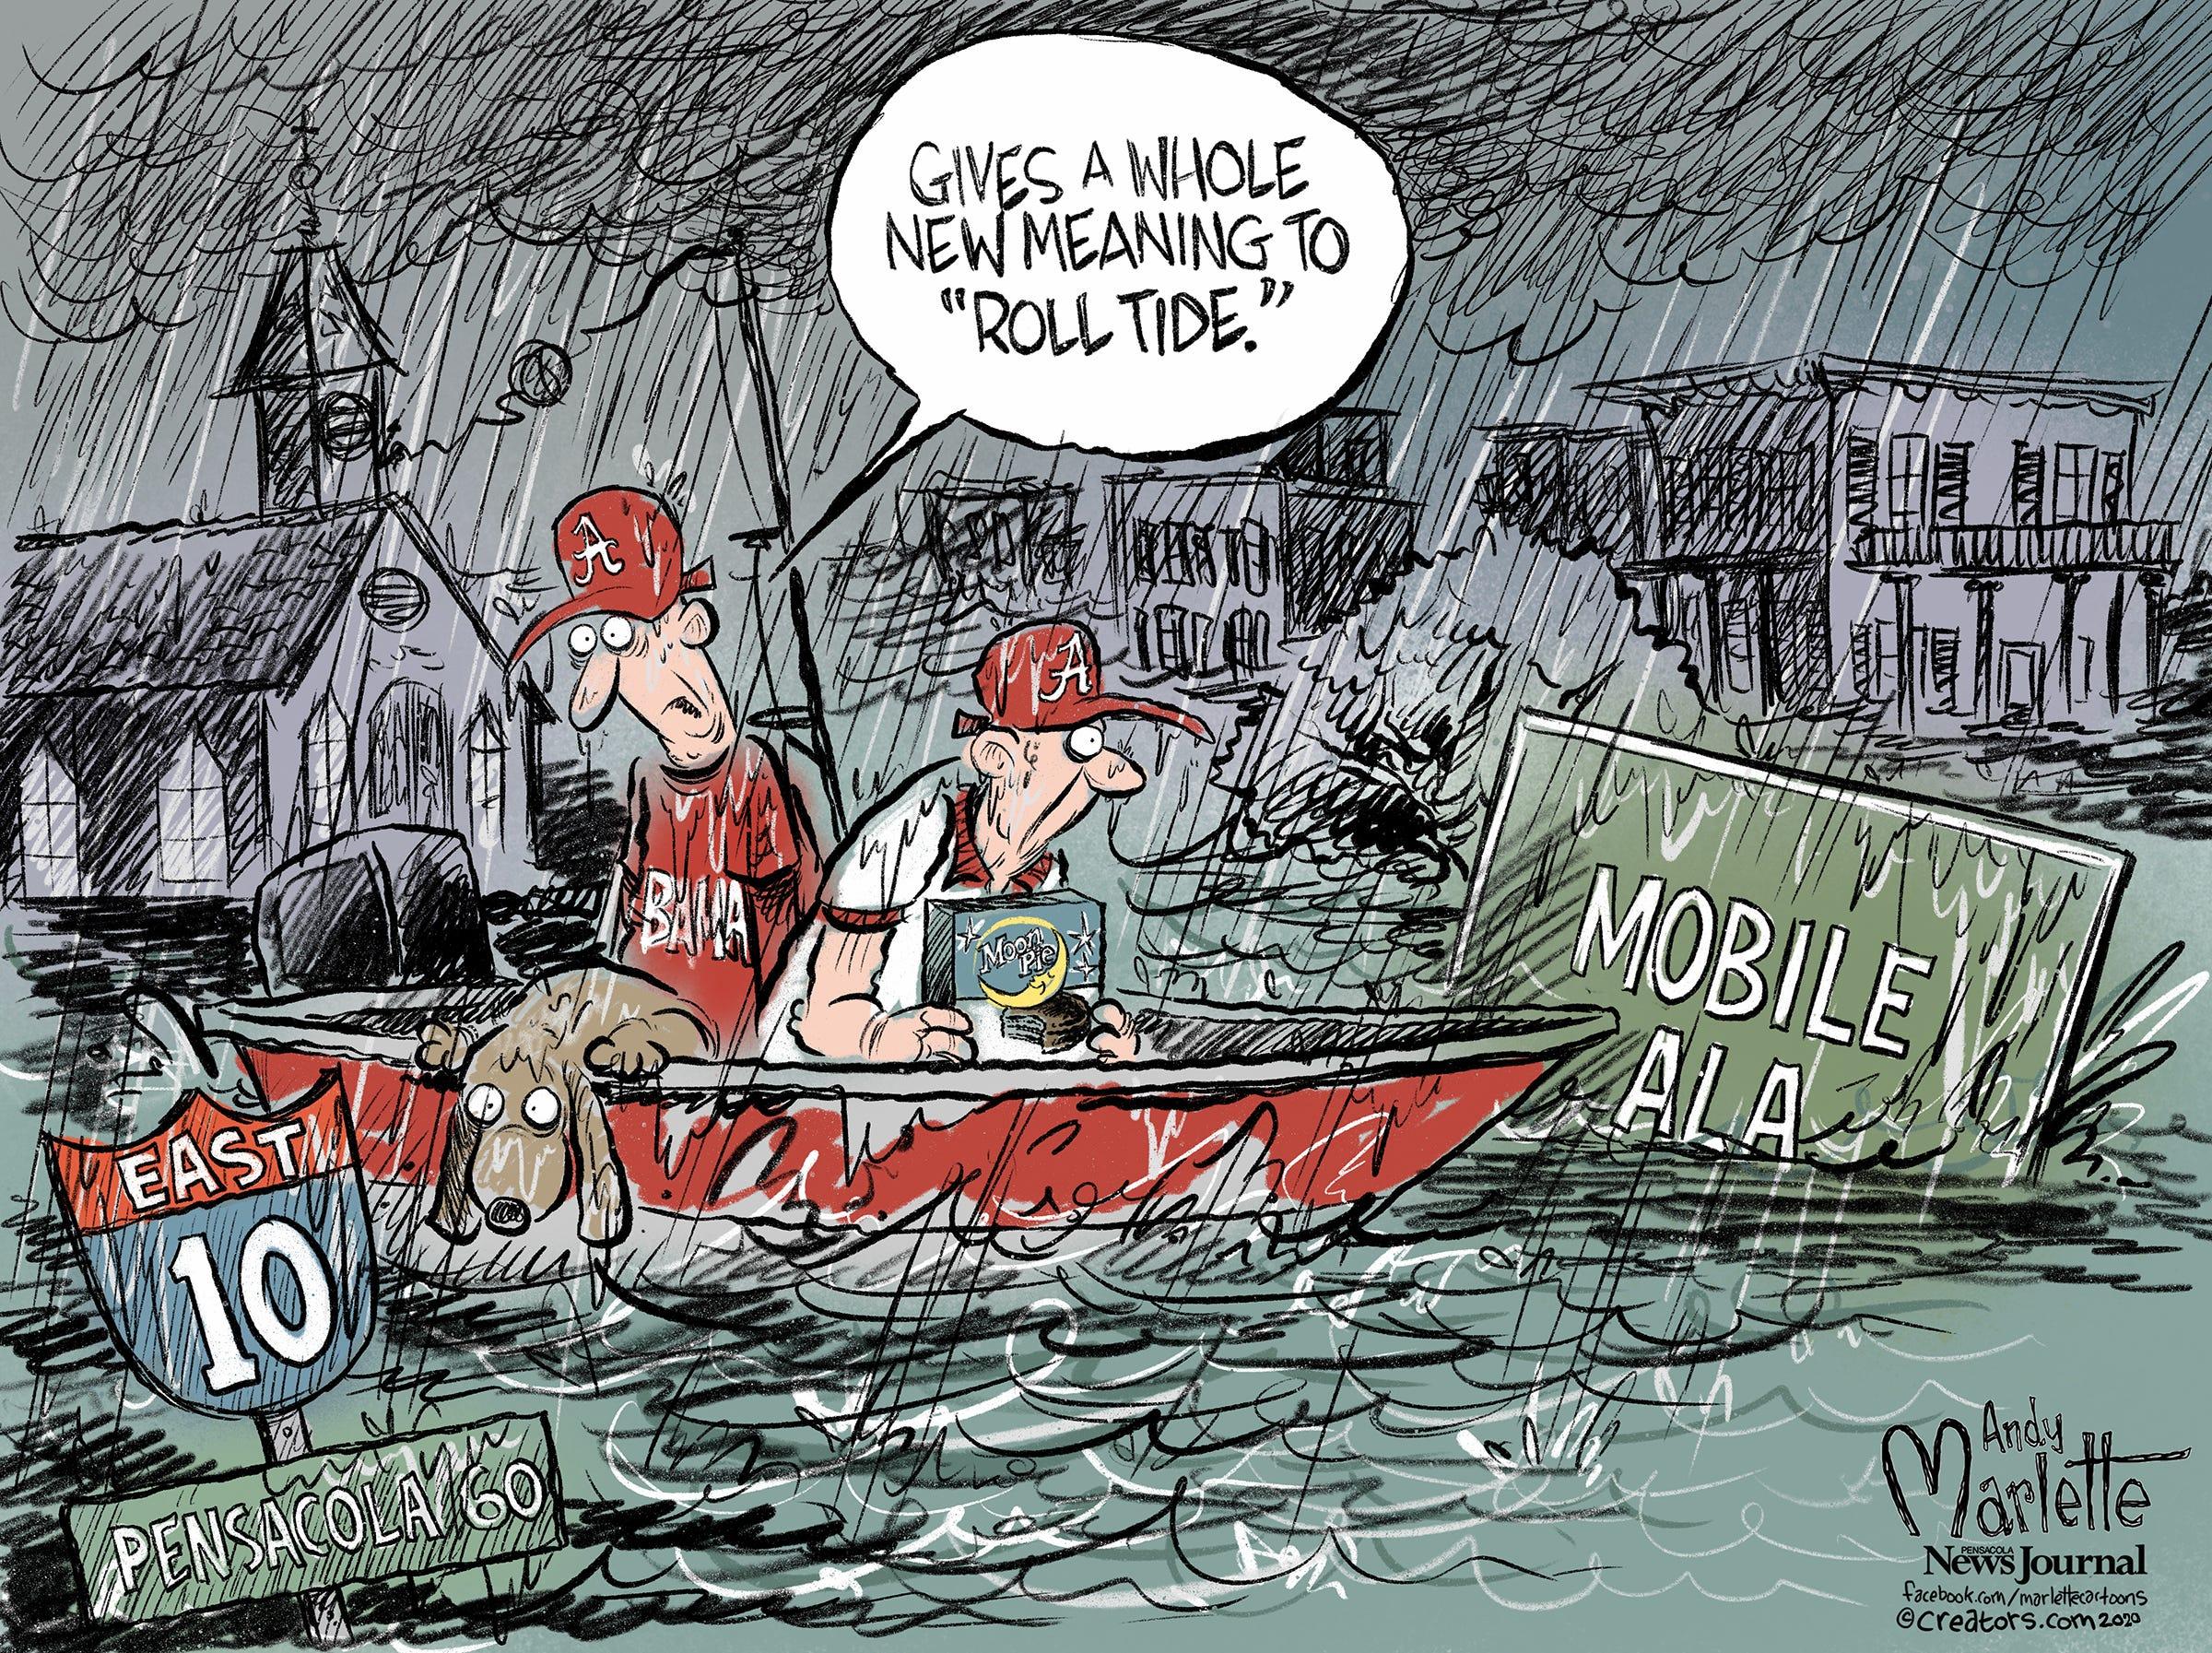 Editorial Cartoon Roll Tide Has New Meanings In Hurricane Season